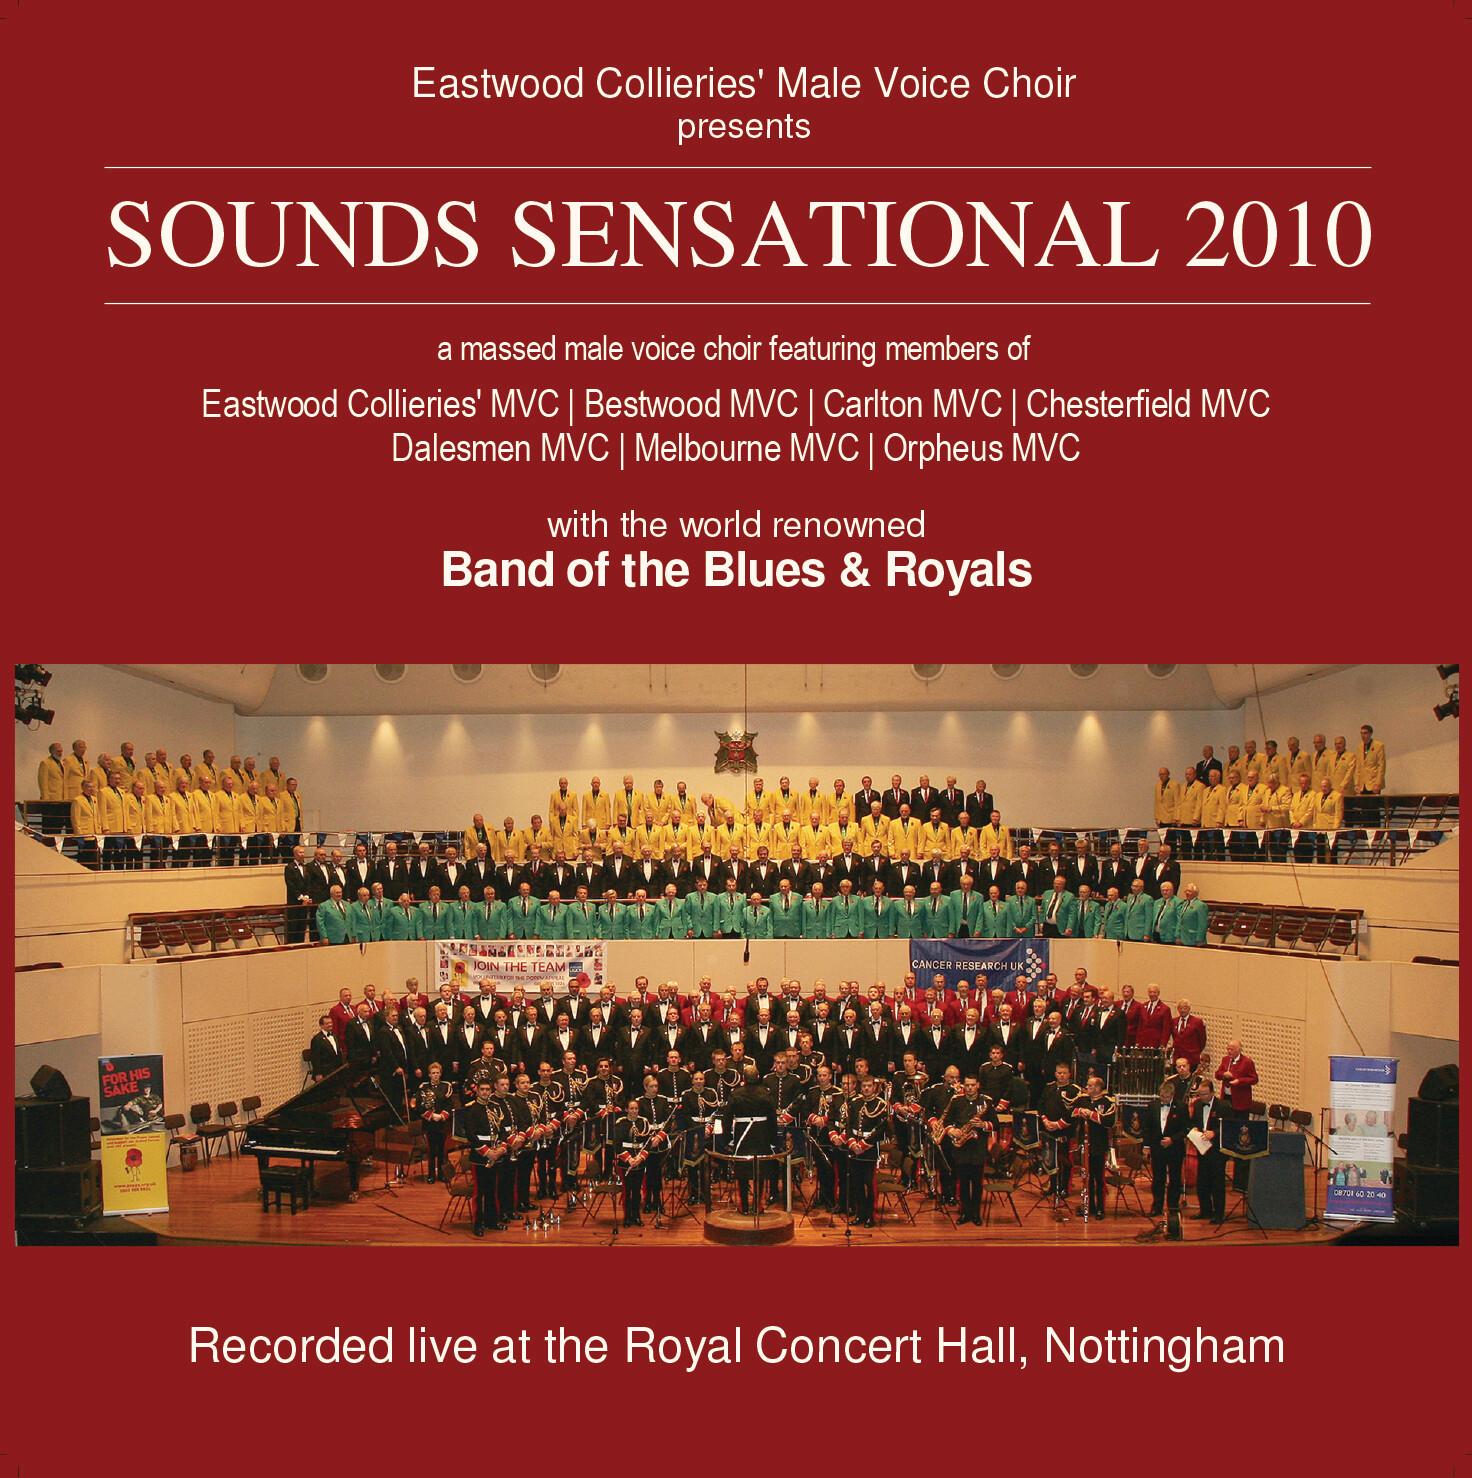 Sounds Sensational 2010